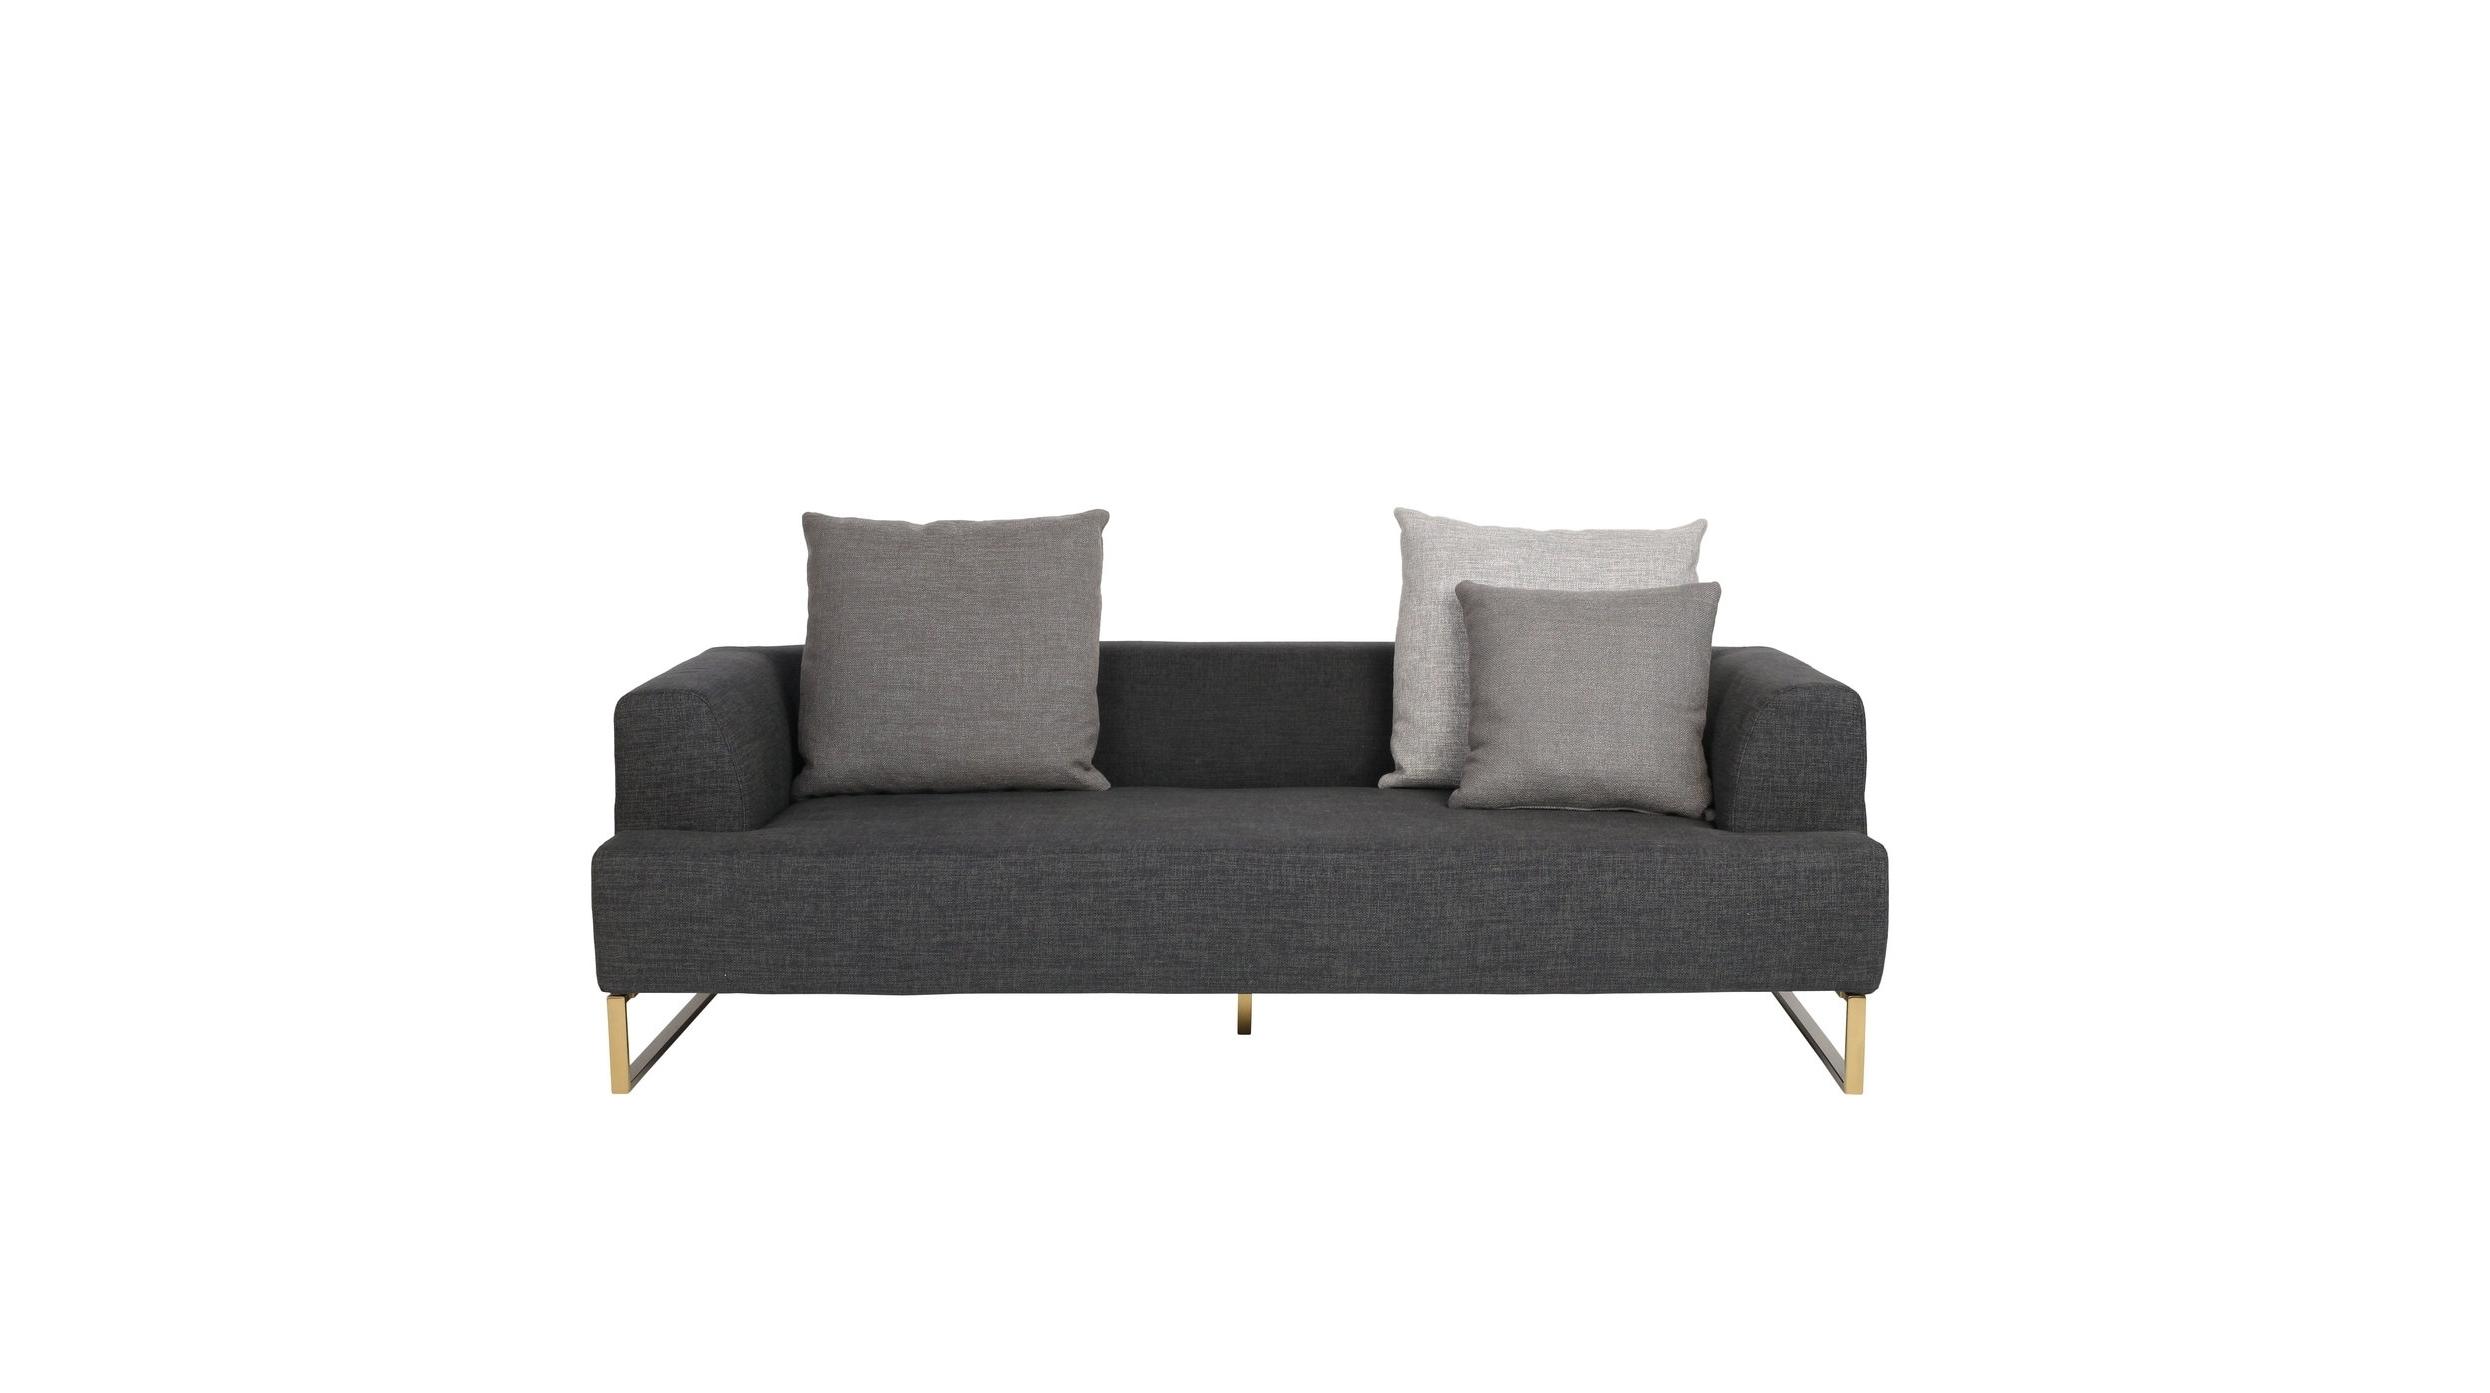 sofa maker modern wooden furniture design set demi